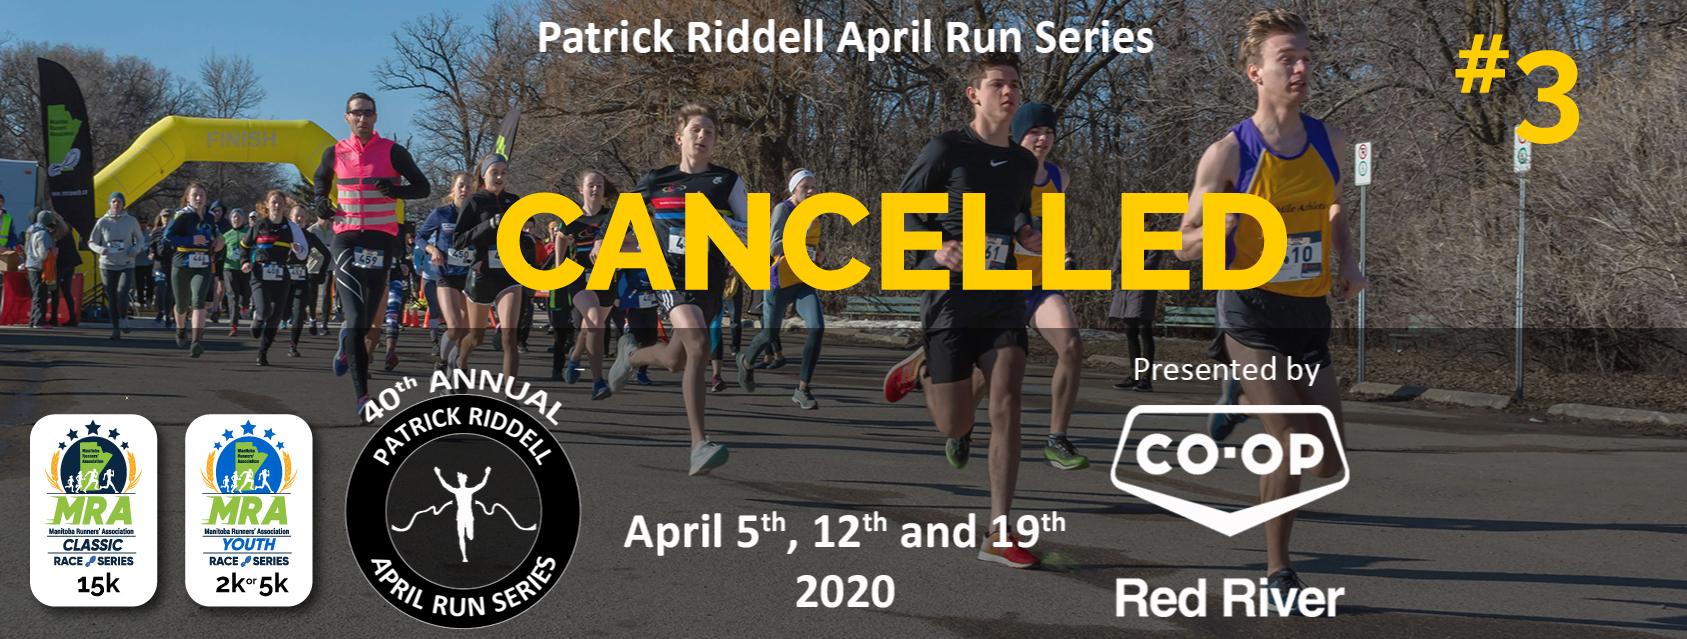 MRAheaderslider2020_patrick3_cancelled